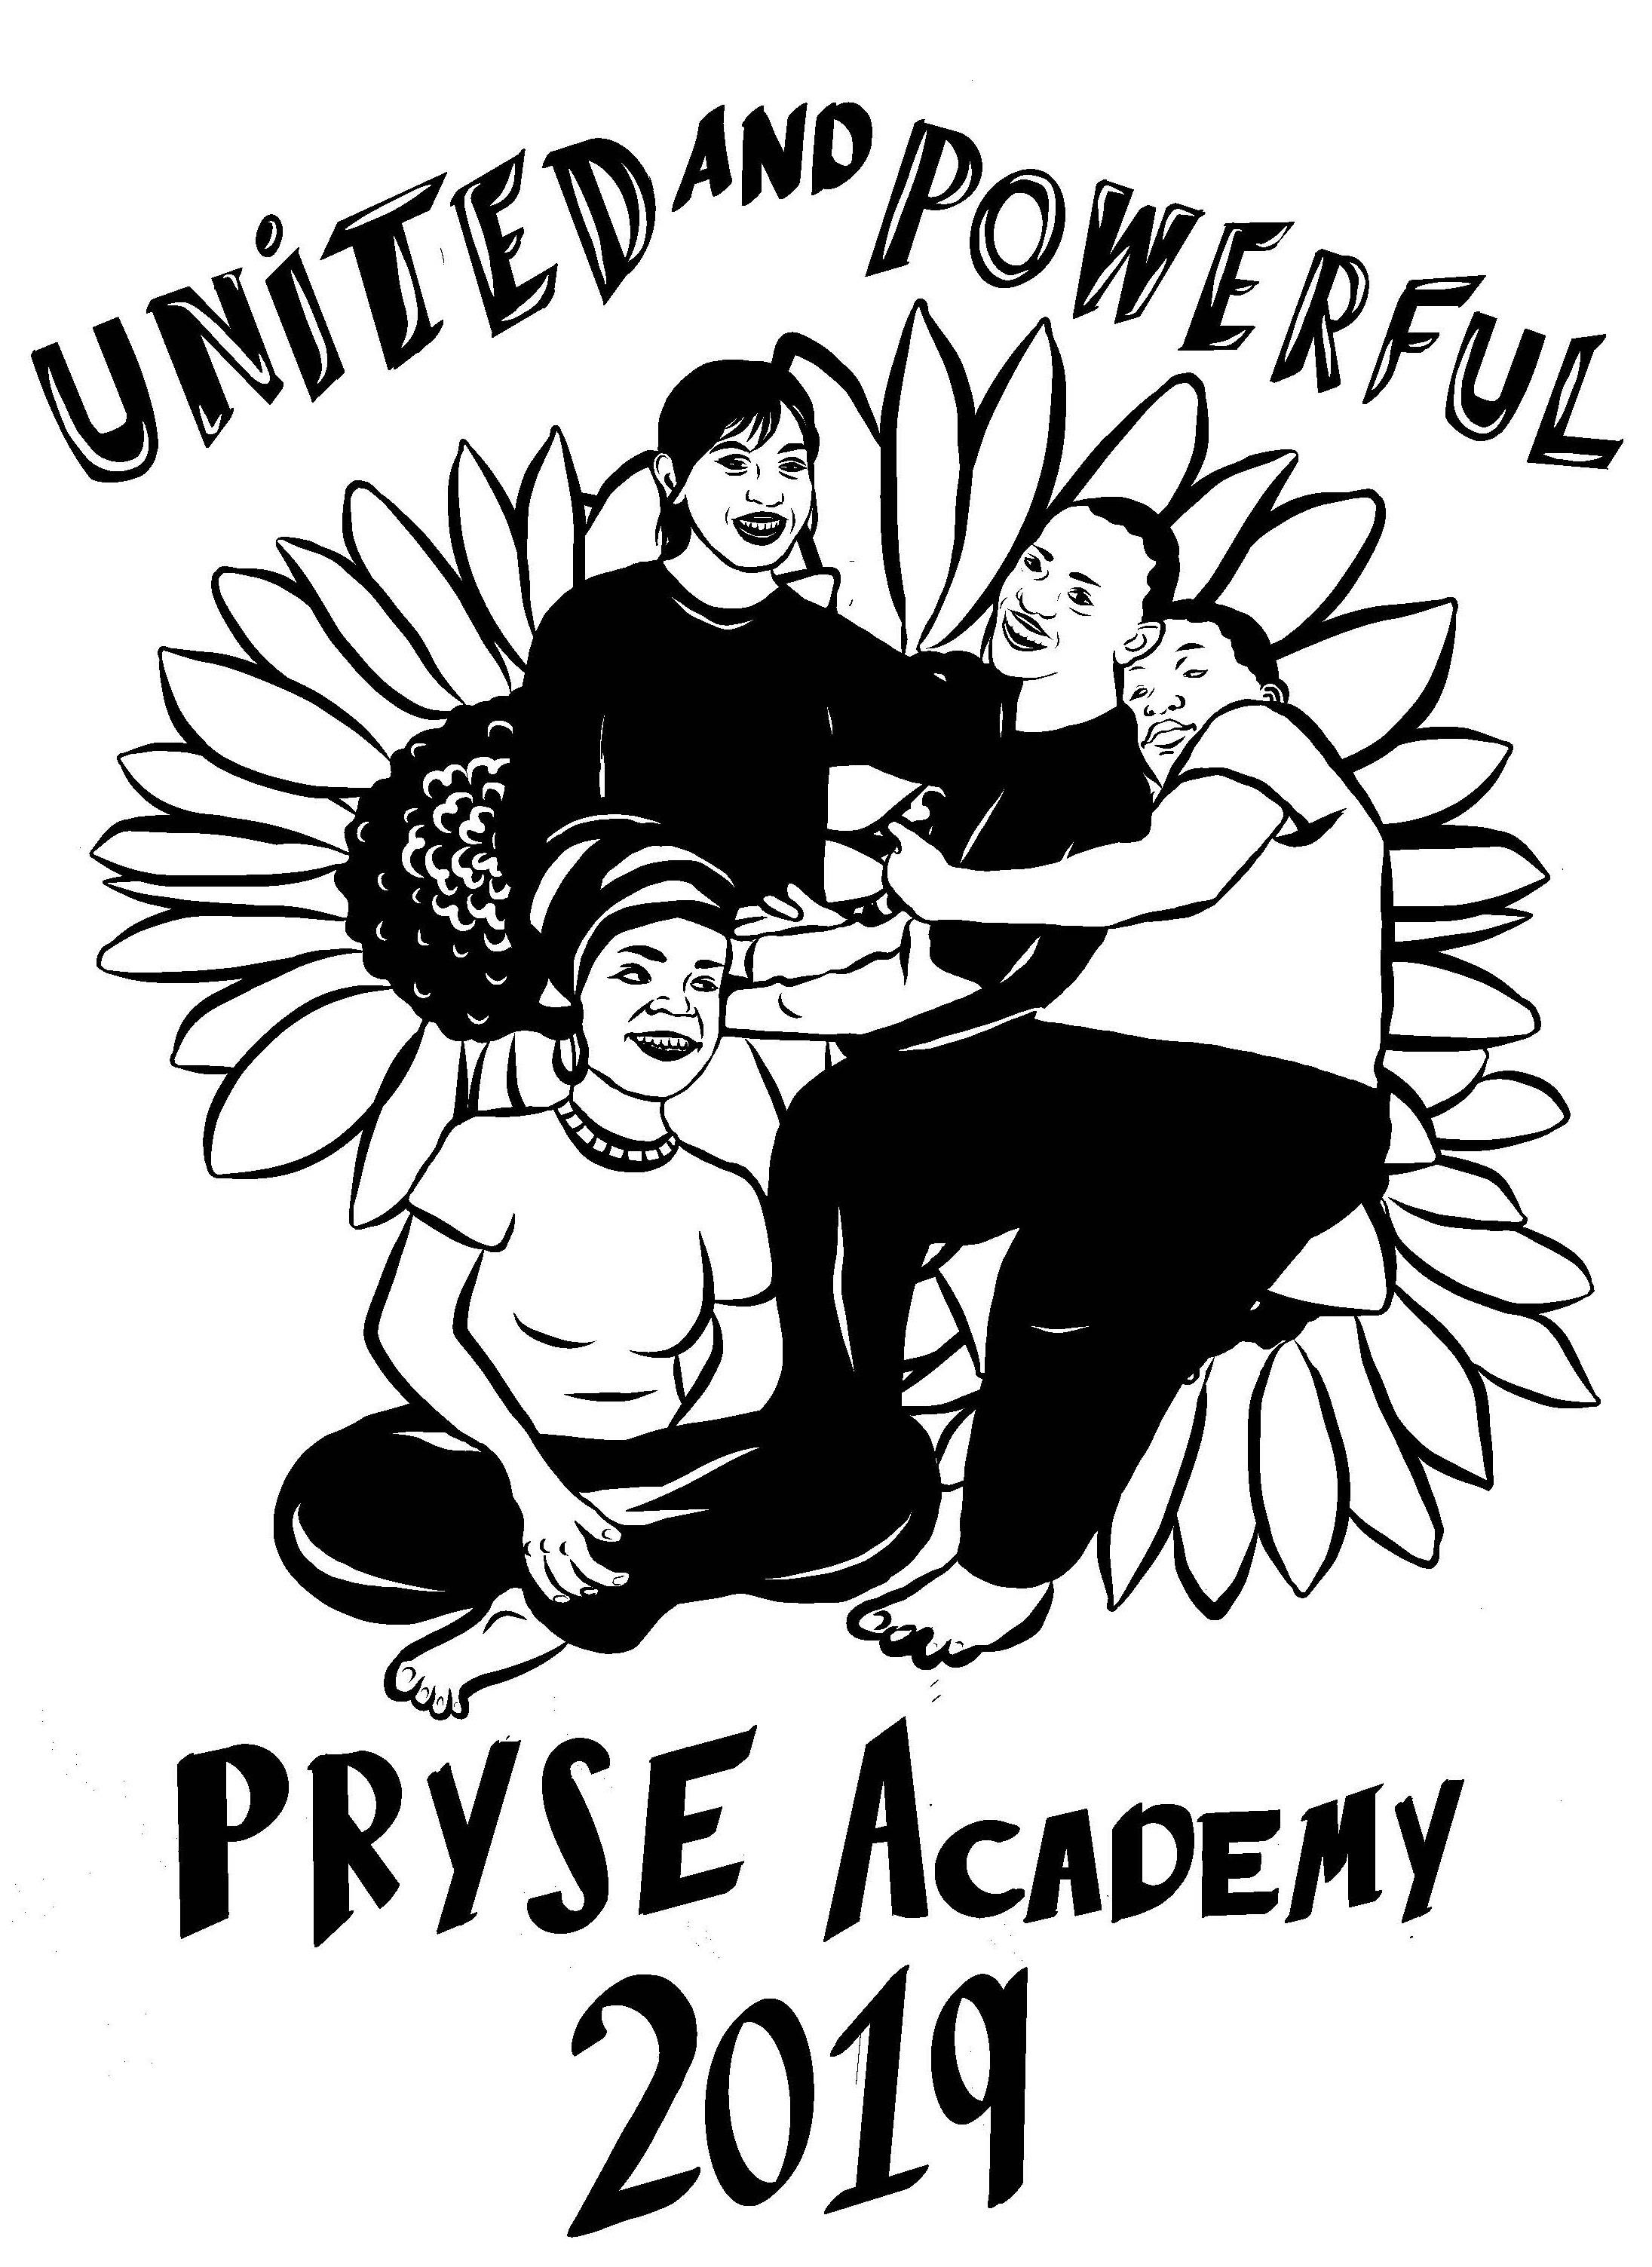 PRYSE Academy 2019